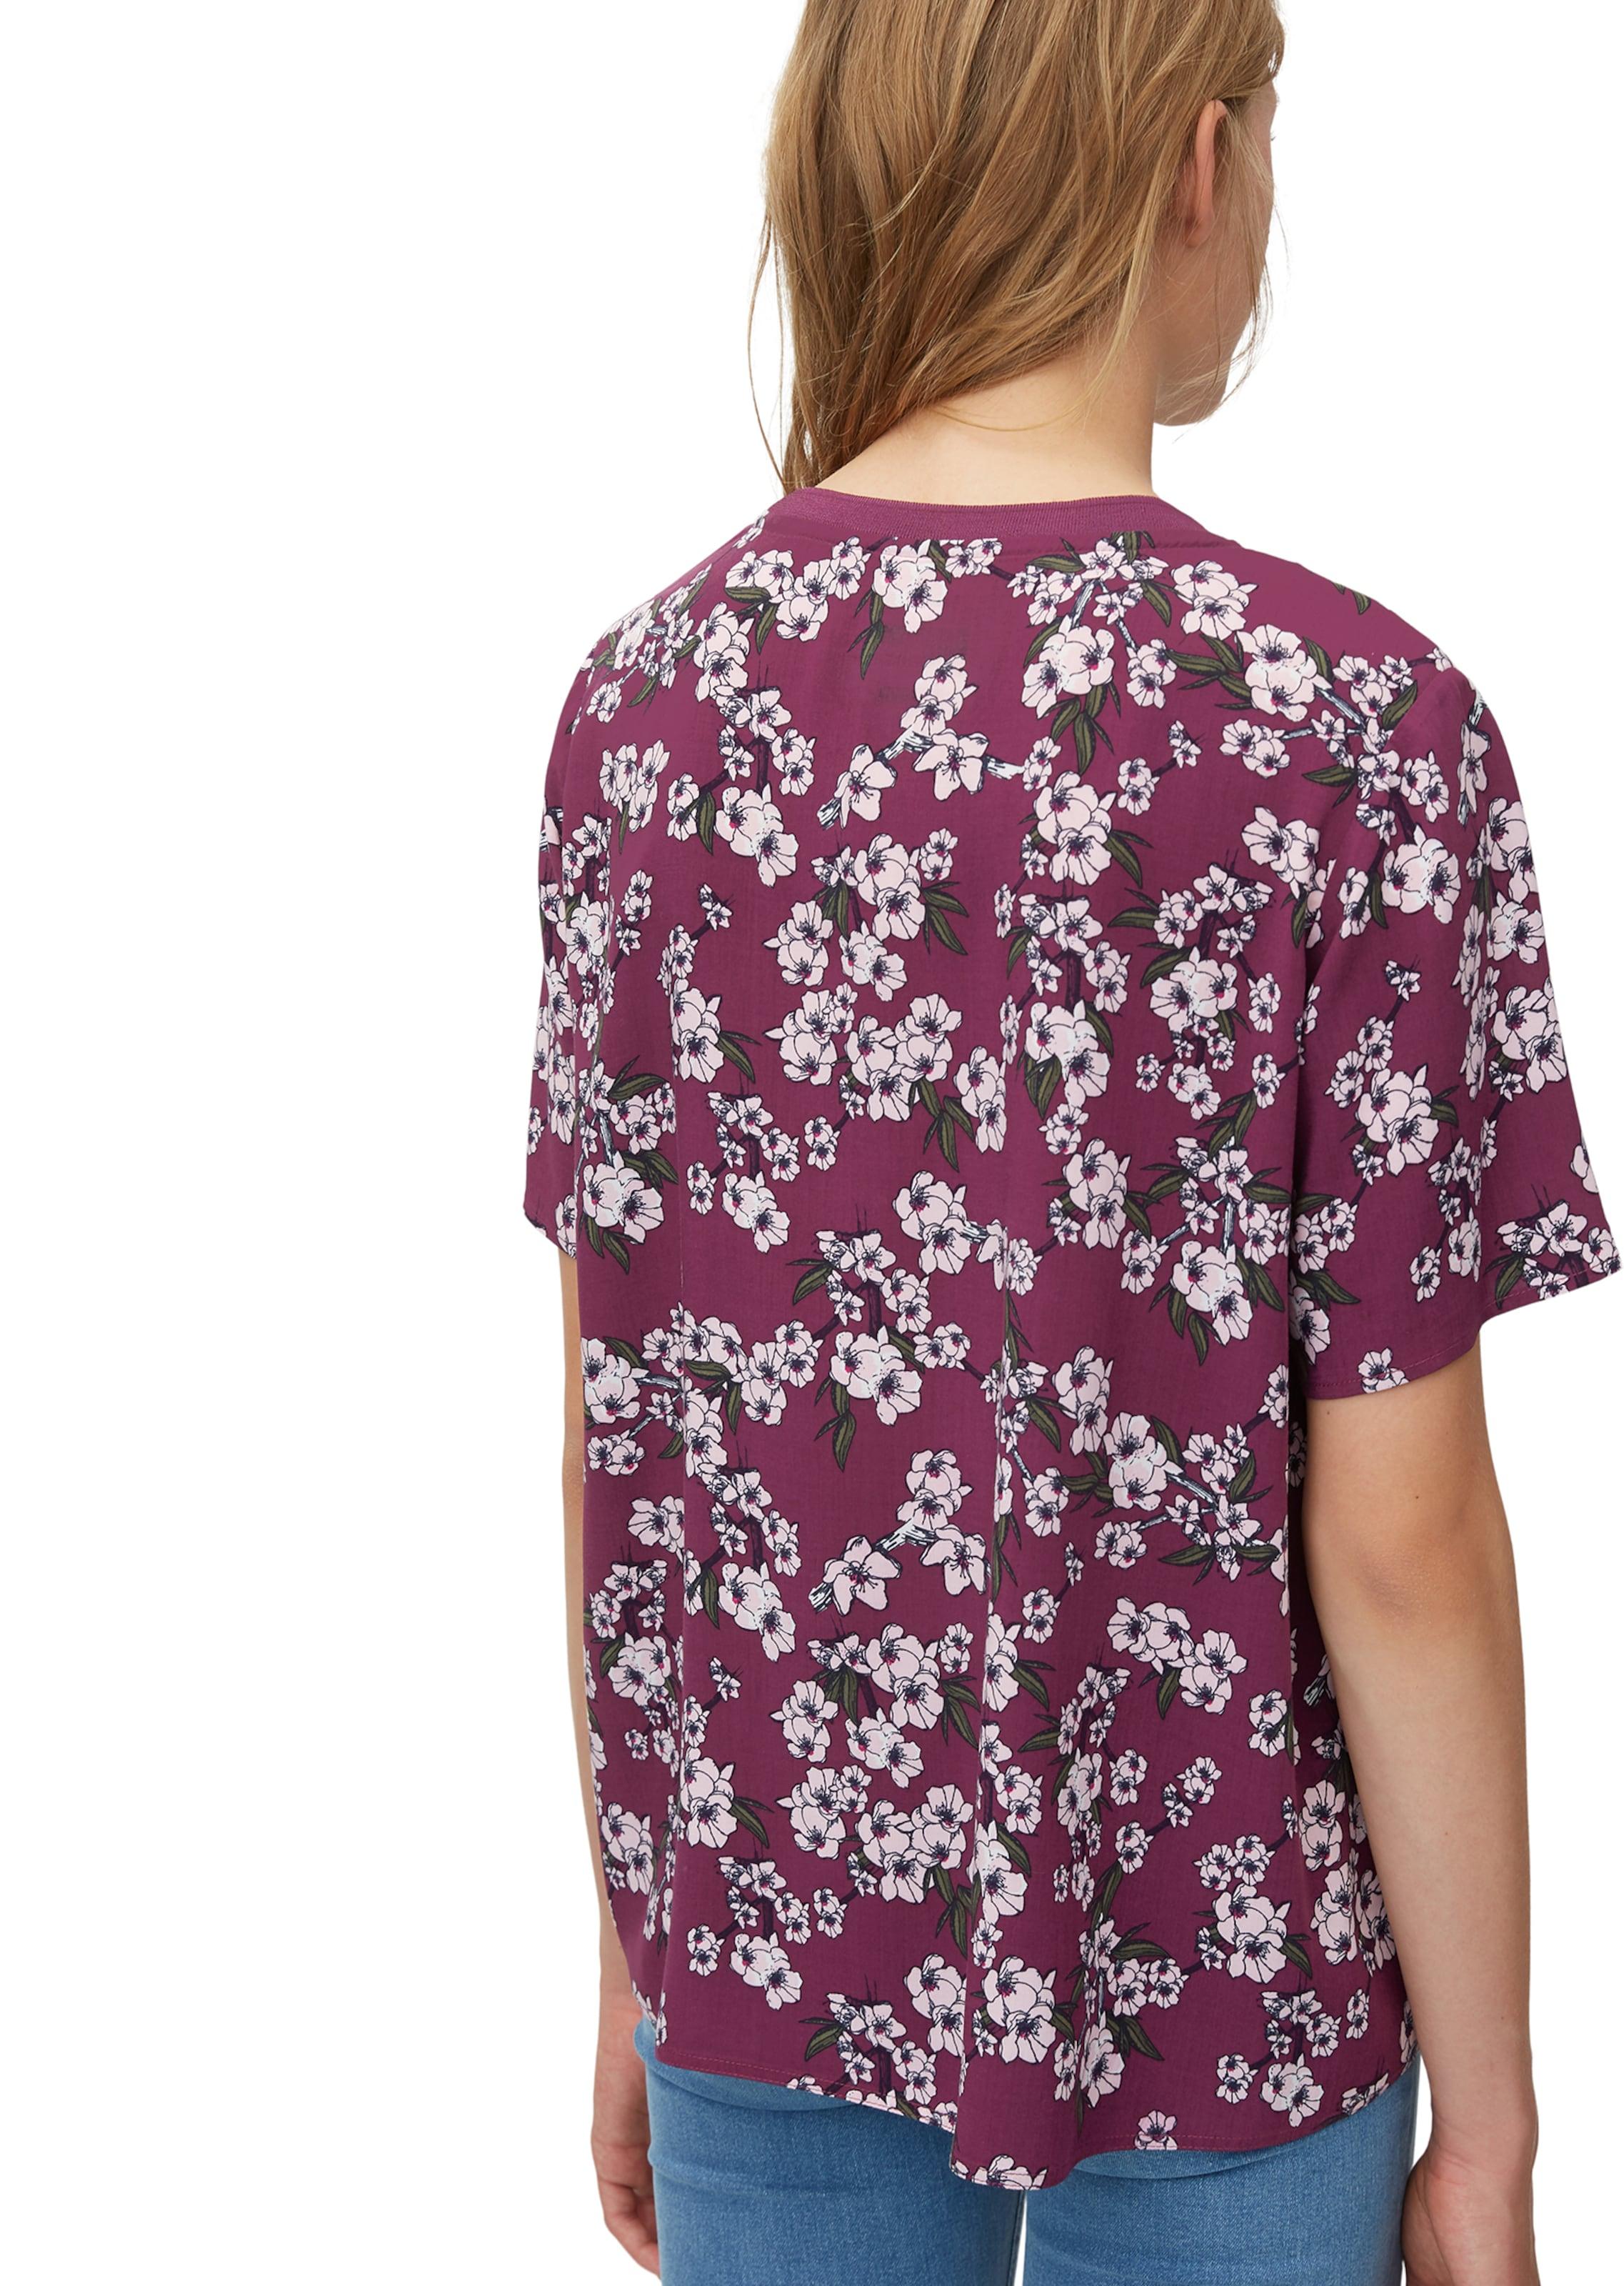 O'polo Dunkelrot T Denim Marc shirt In uFKlJc3T15